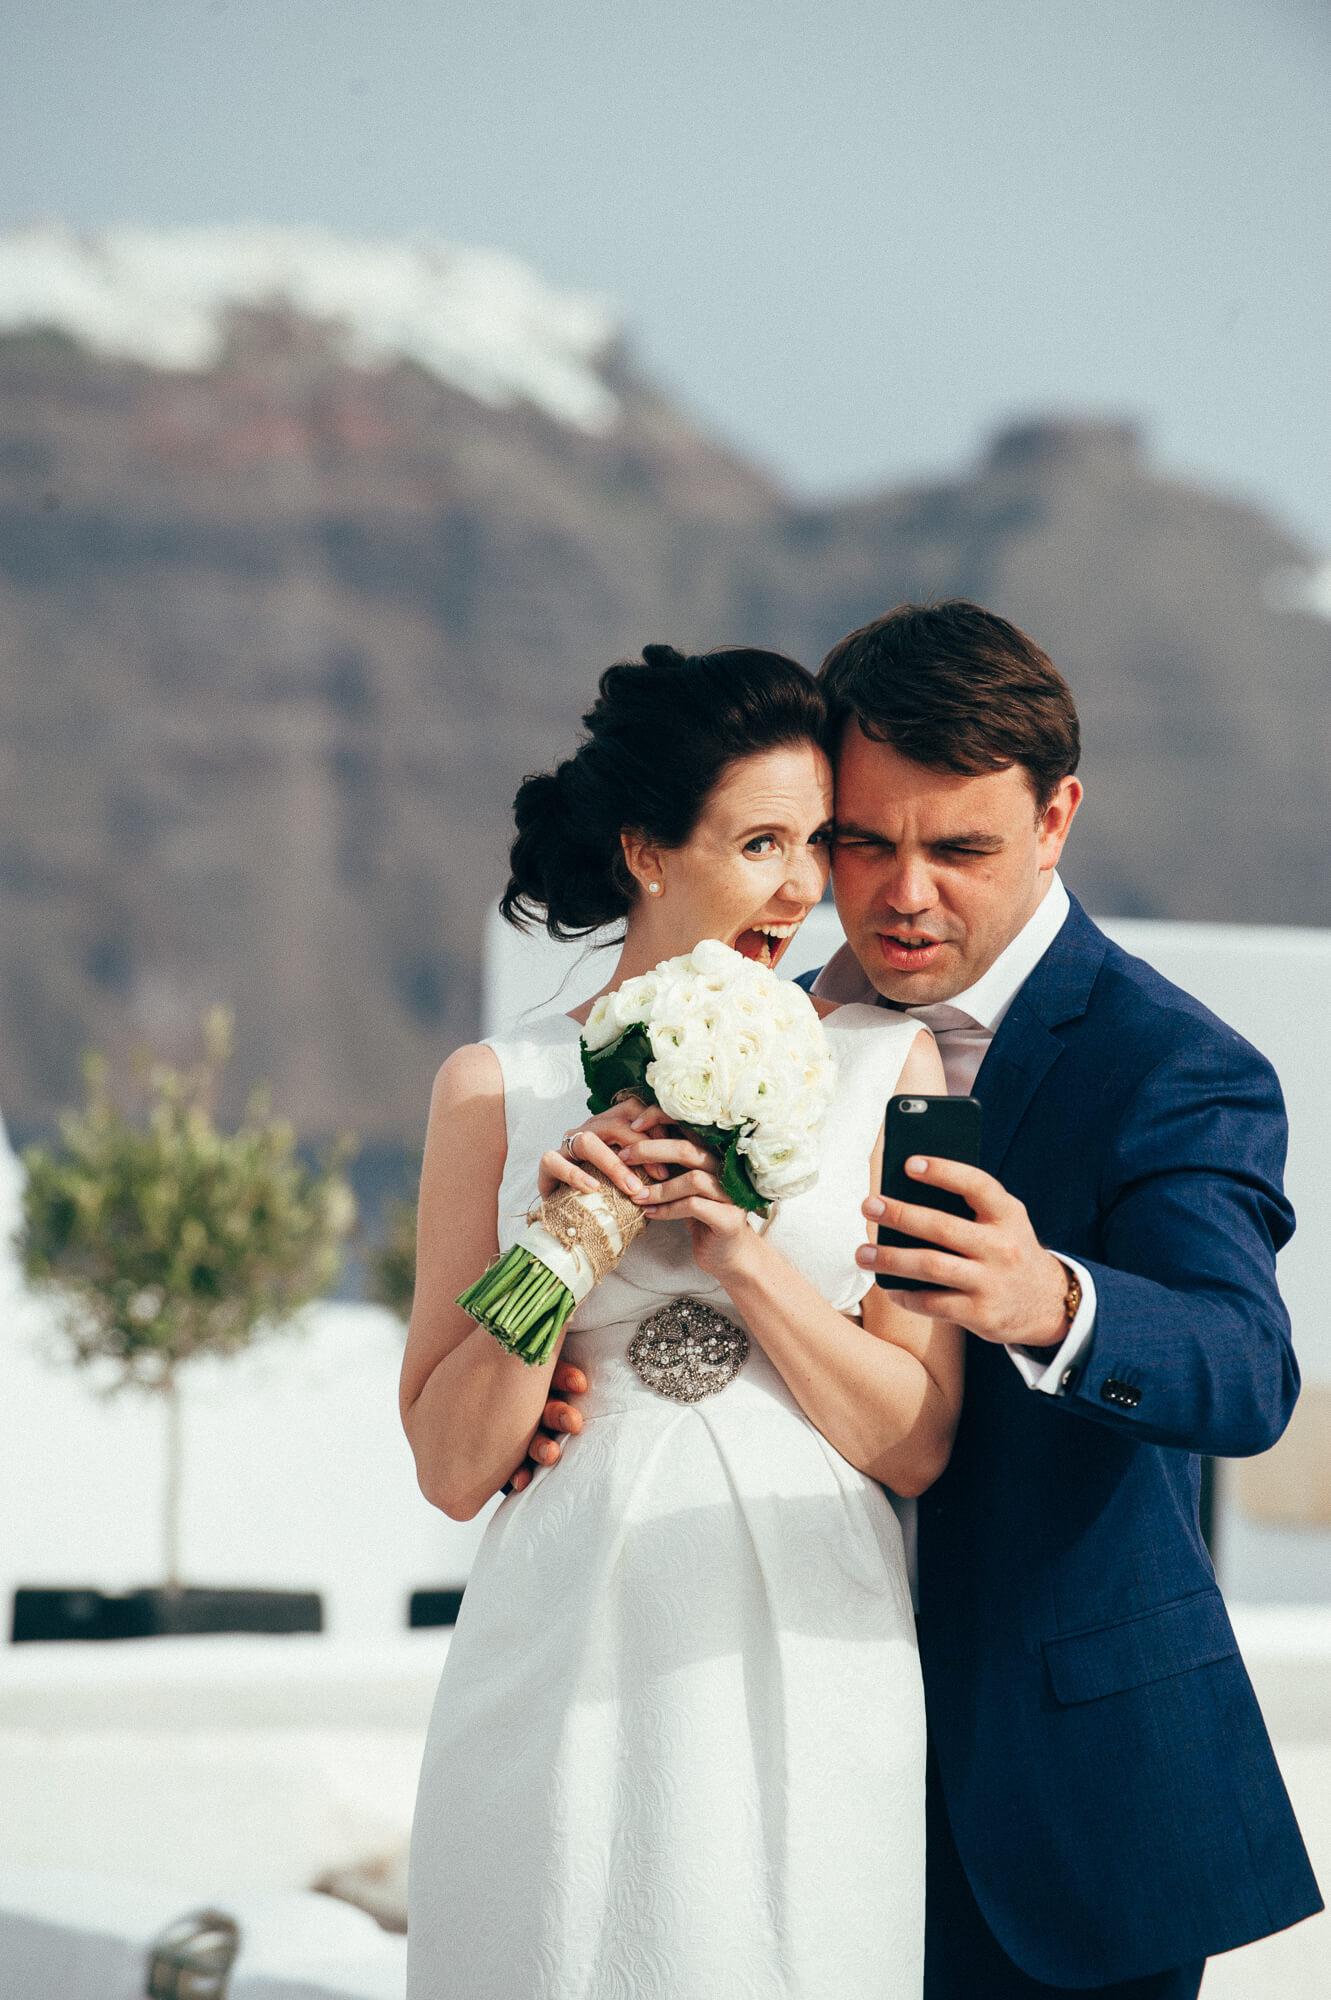 manes-wedding-photographer-greece-152